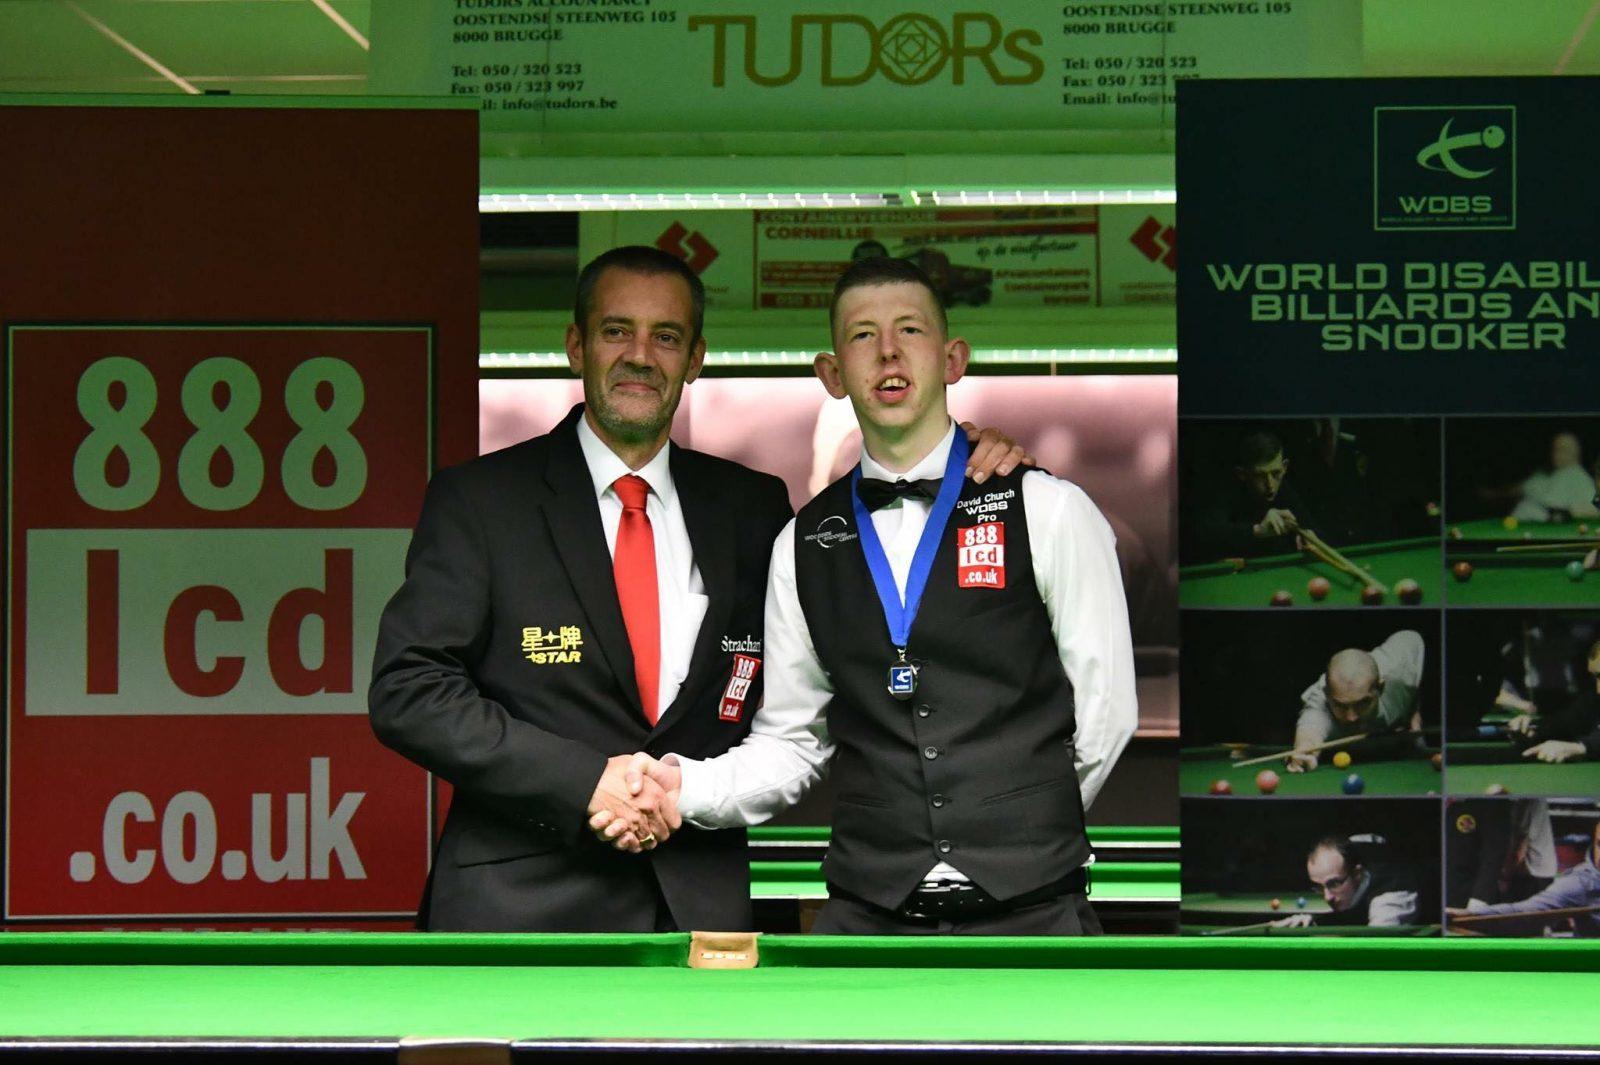 David Church WDBS Pro Snooker Player 1